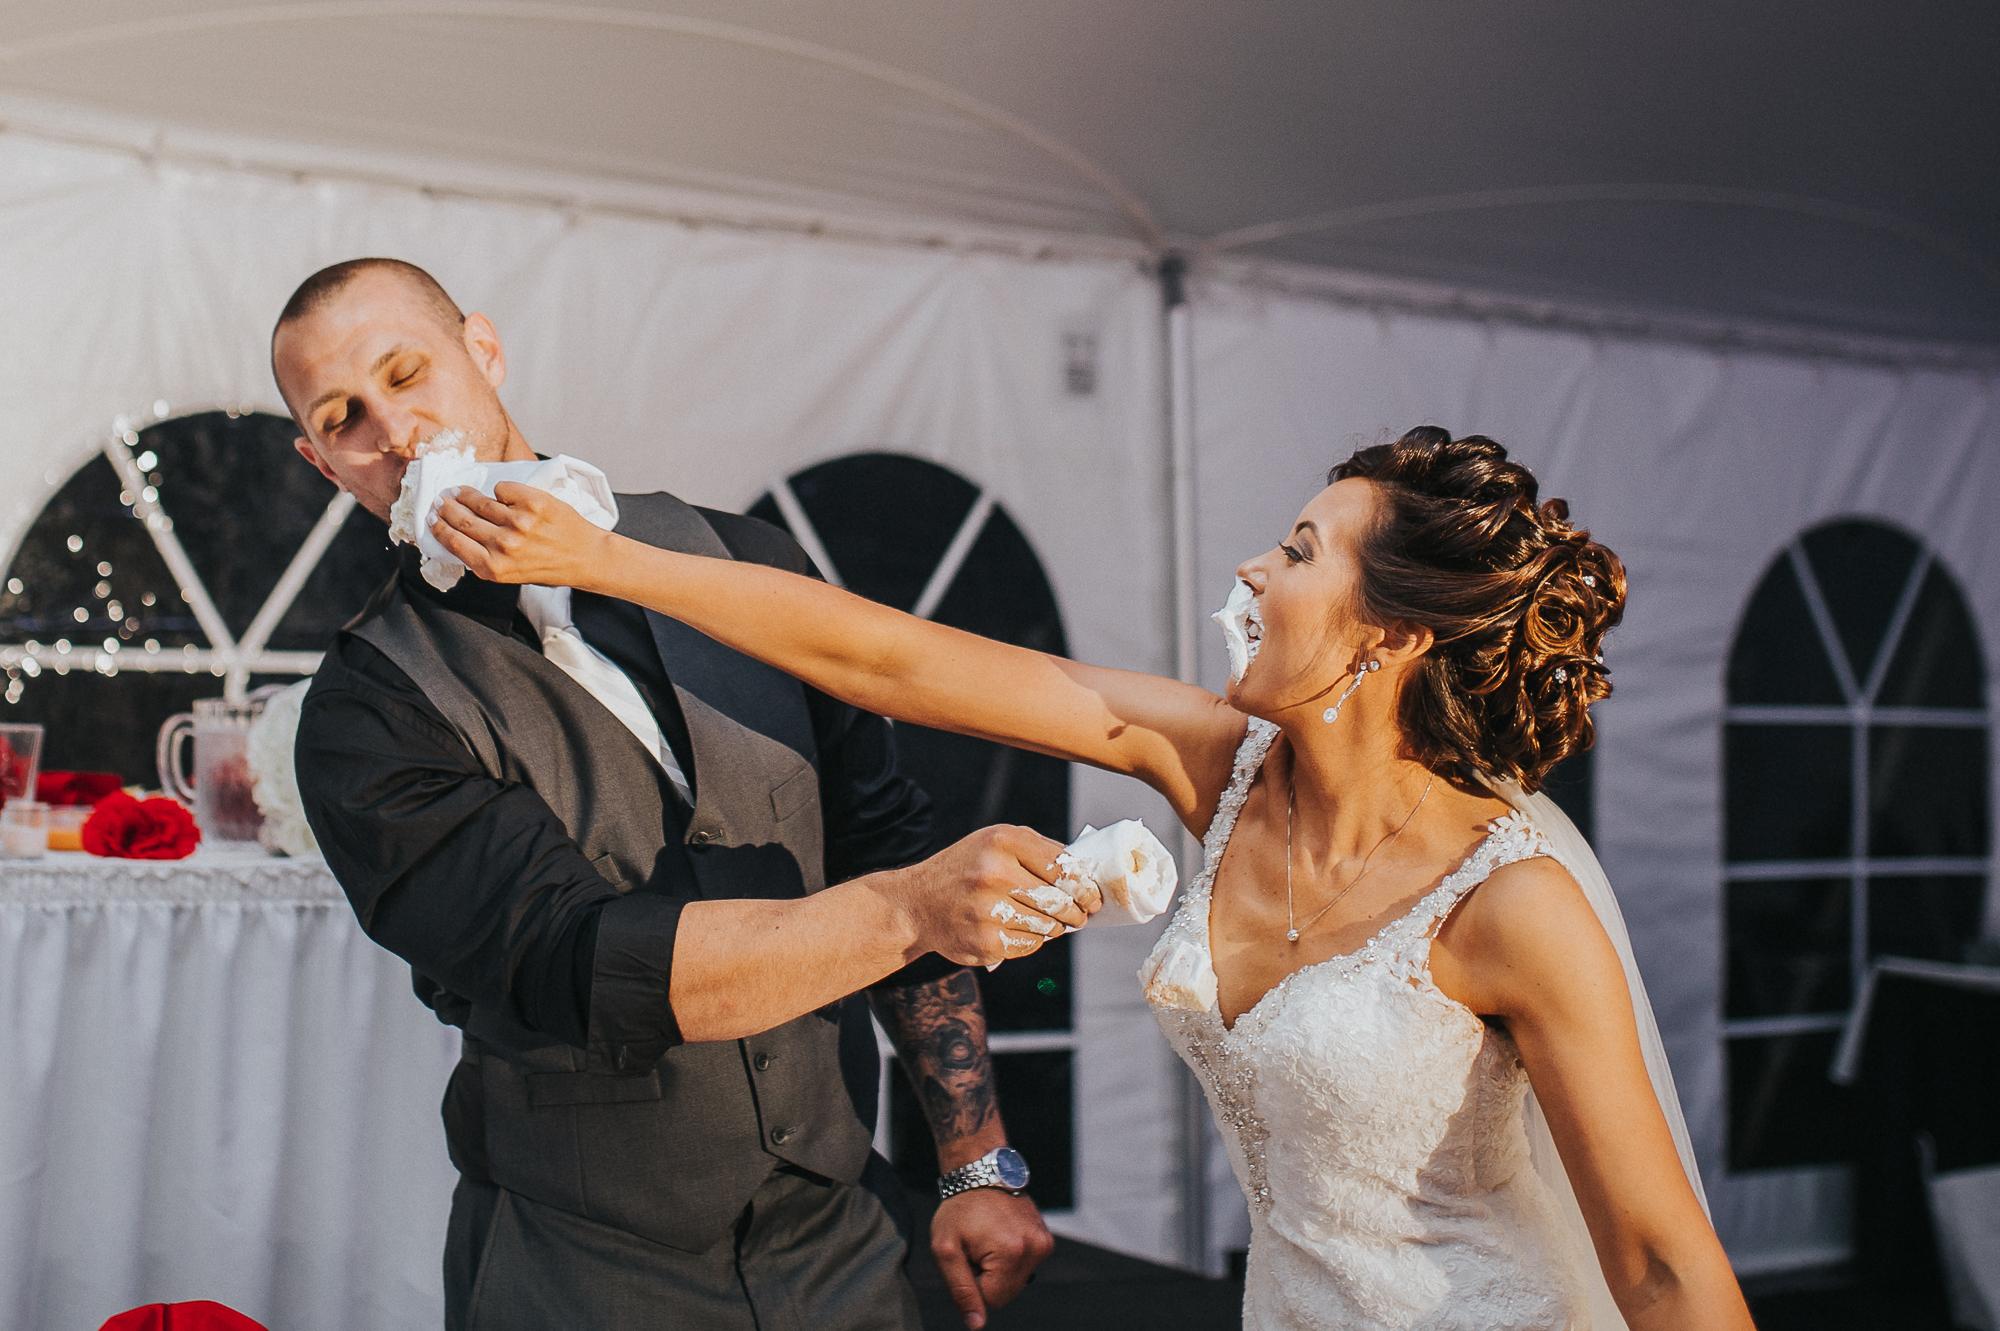 Christina-and-Gene-Wedding-Marla-Rain-Photography-596.jpg